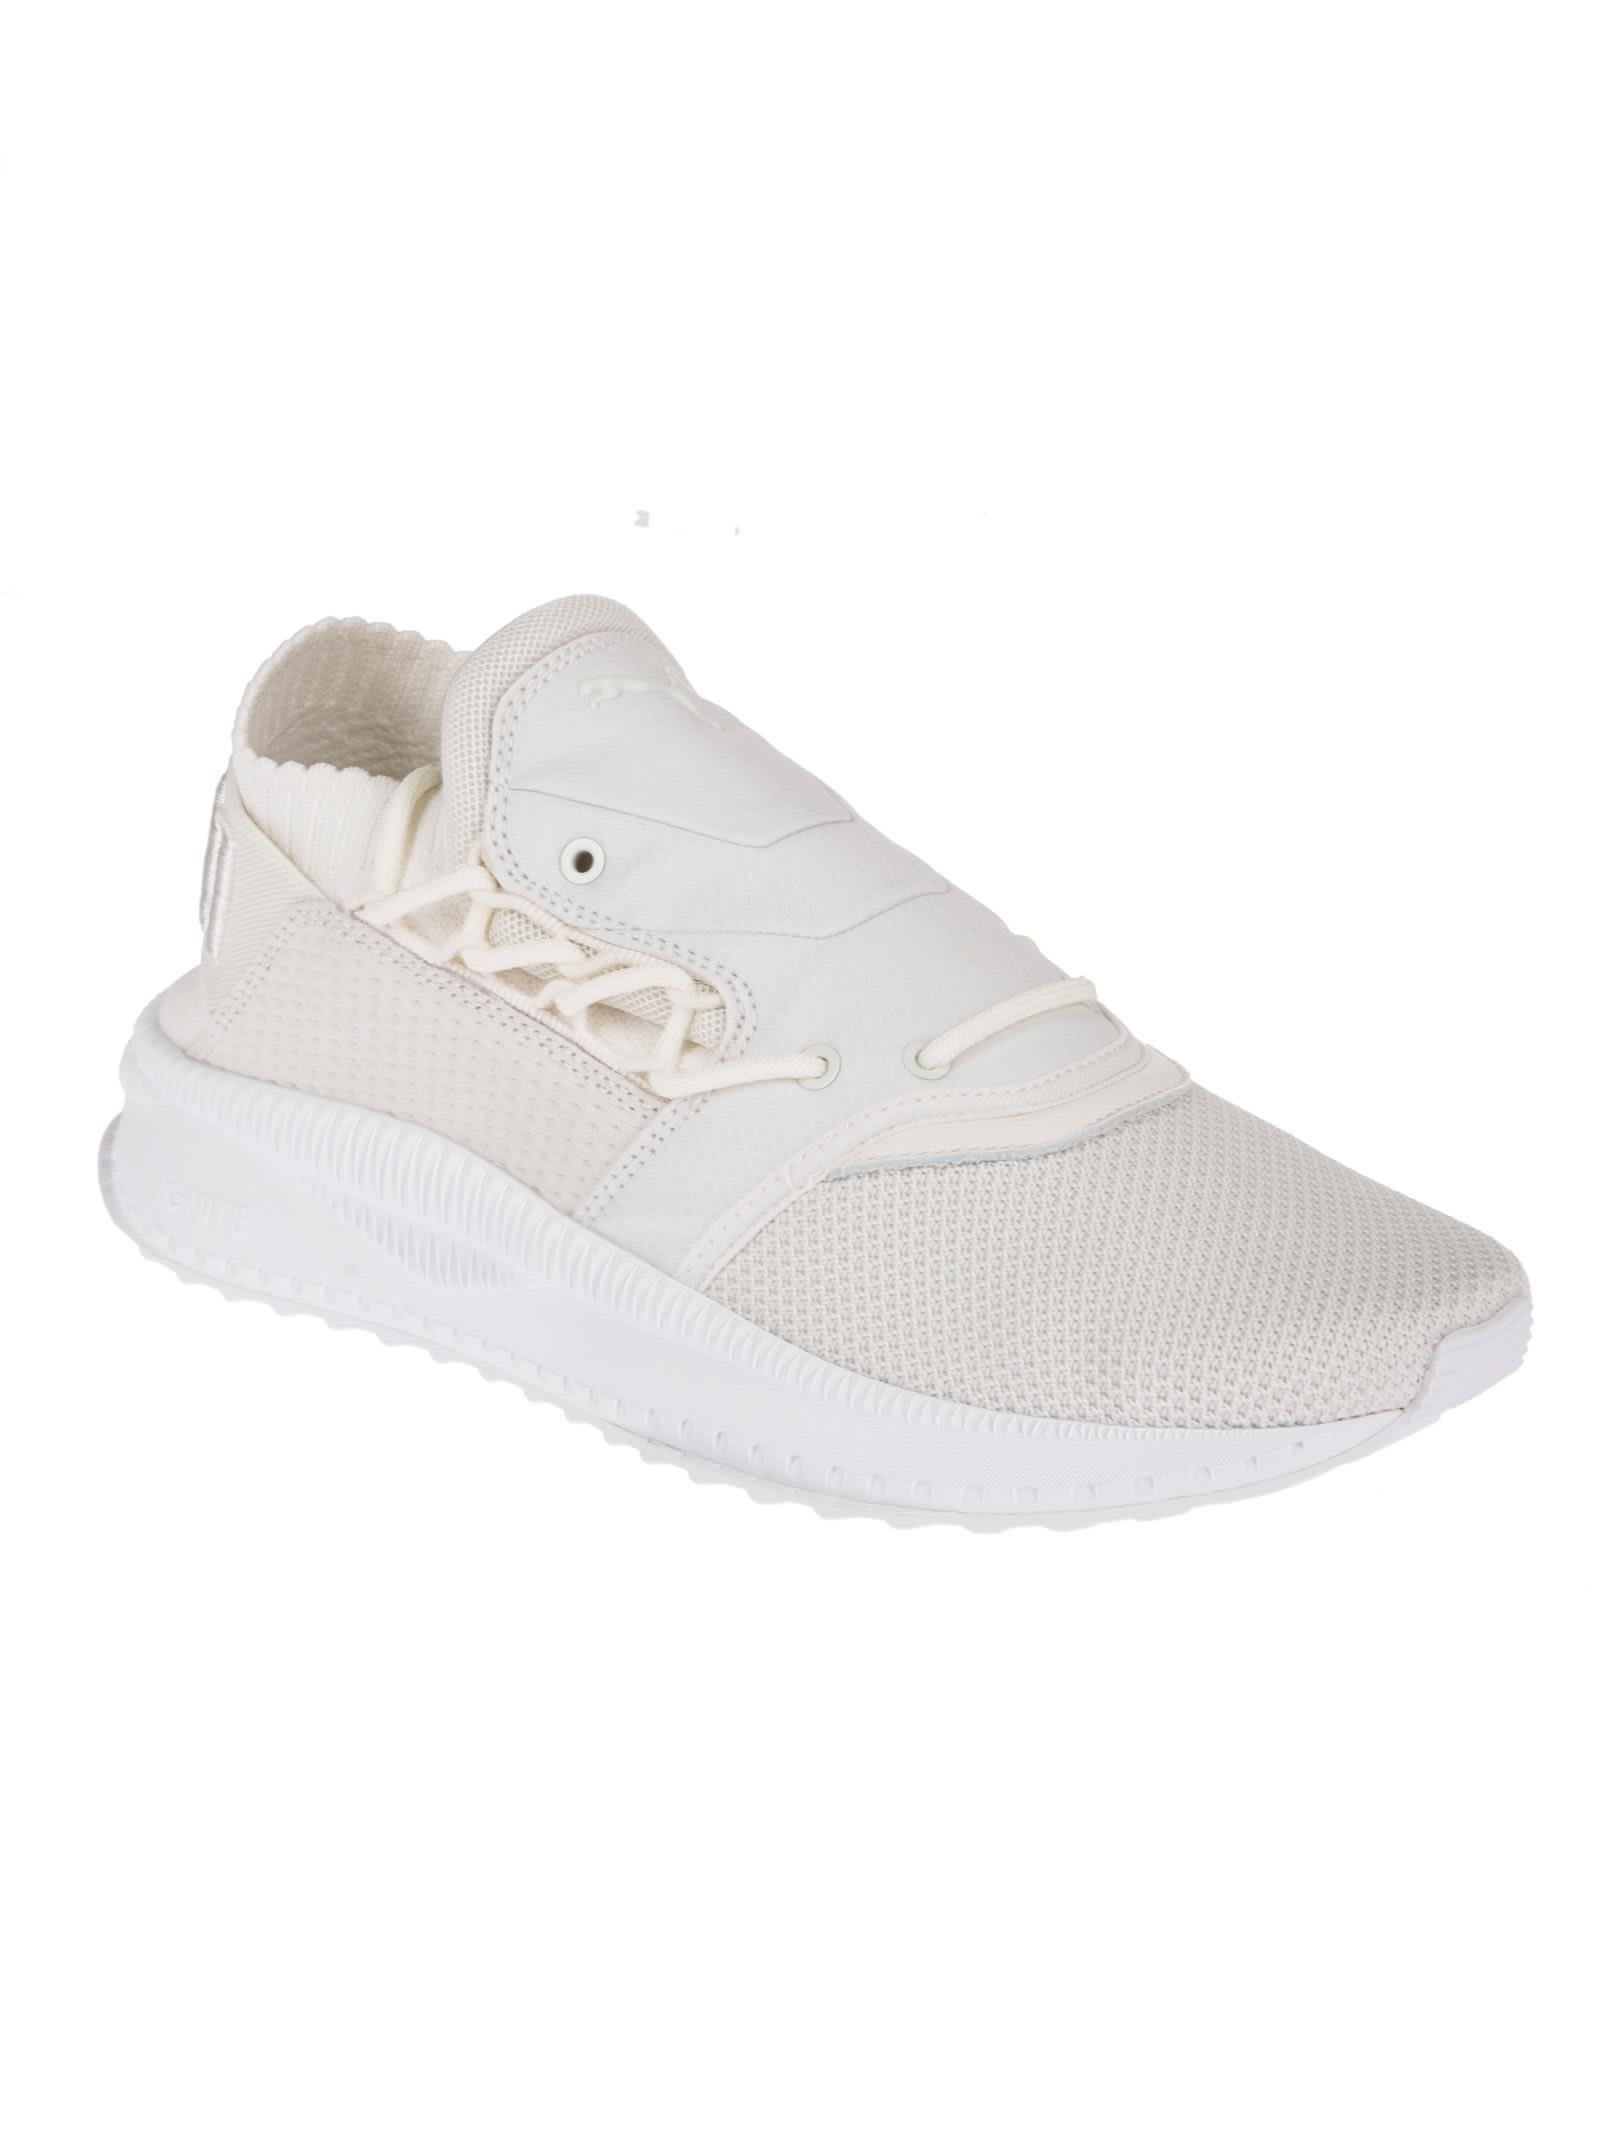 064c3e8af0c2 Puma Puma Tsugi Shinsei Raw Sneakers - Basic - 10675780